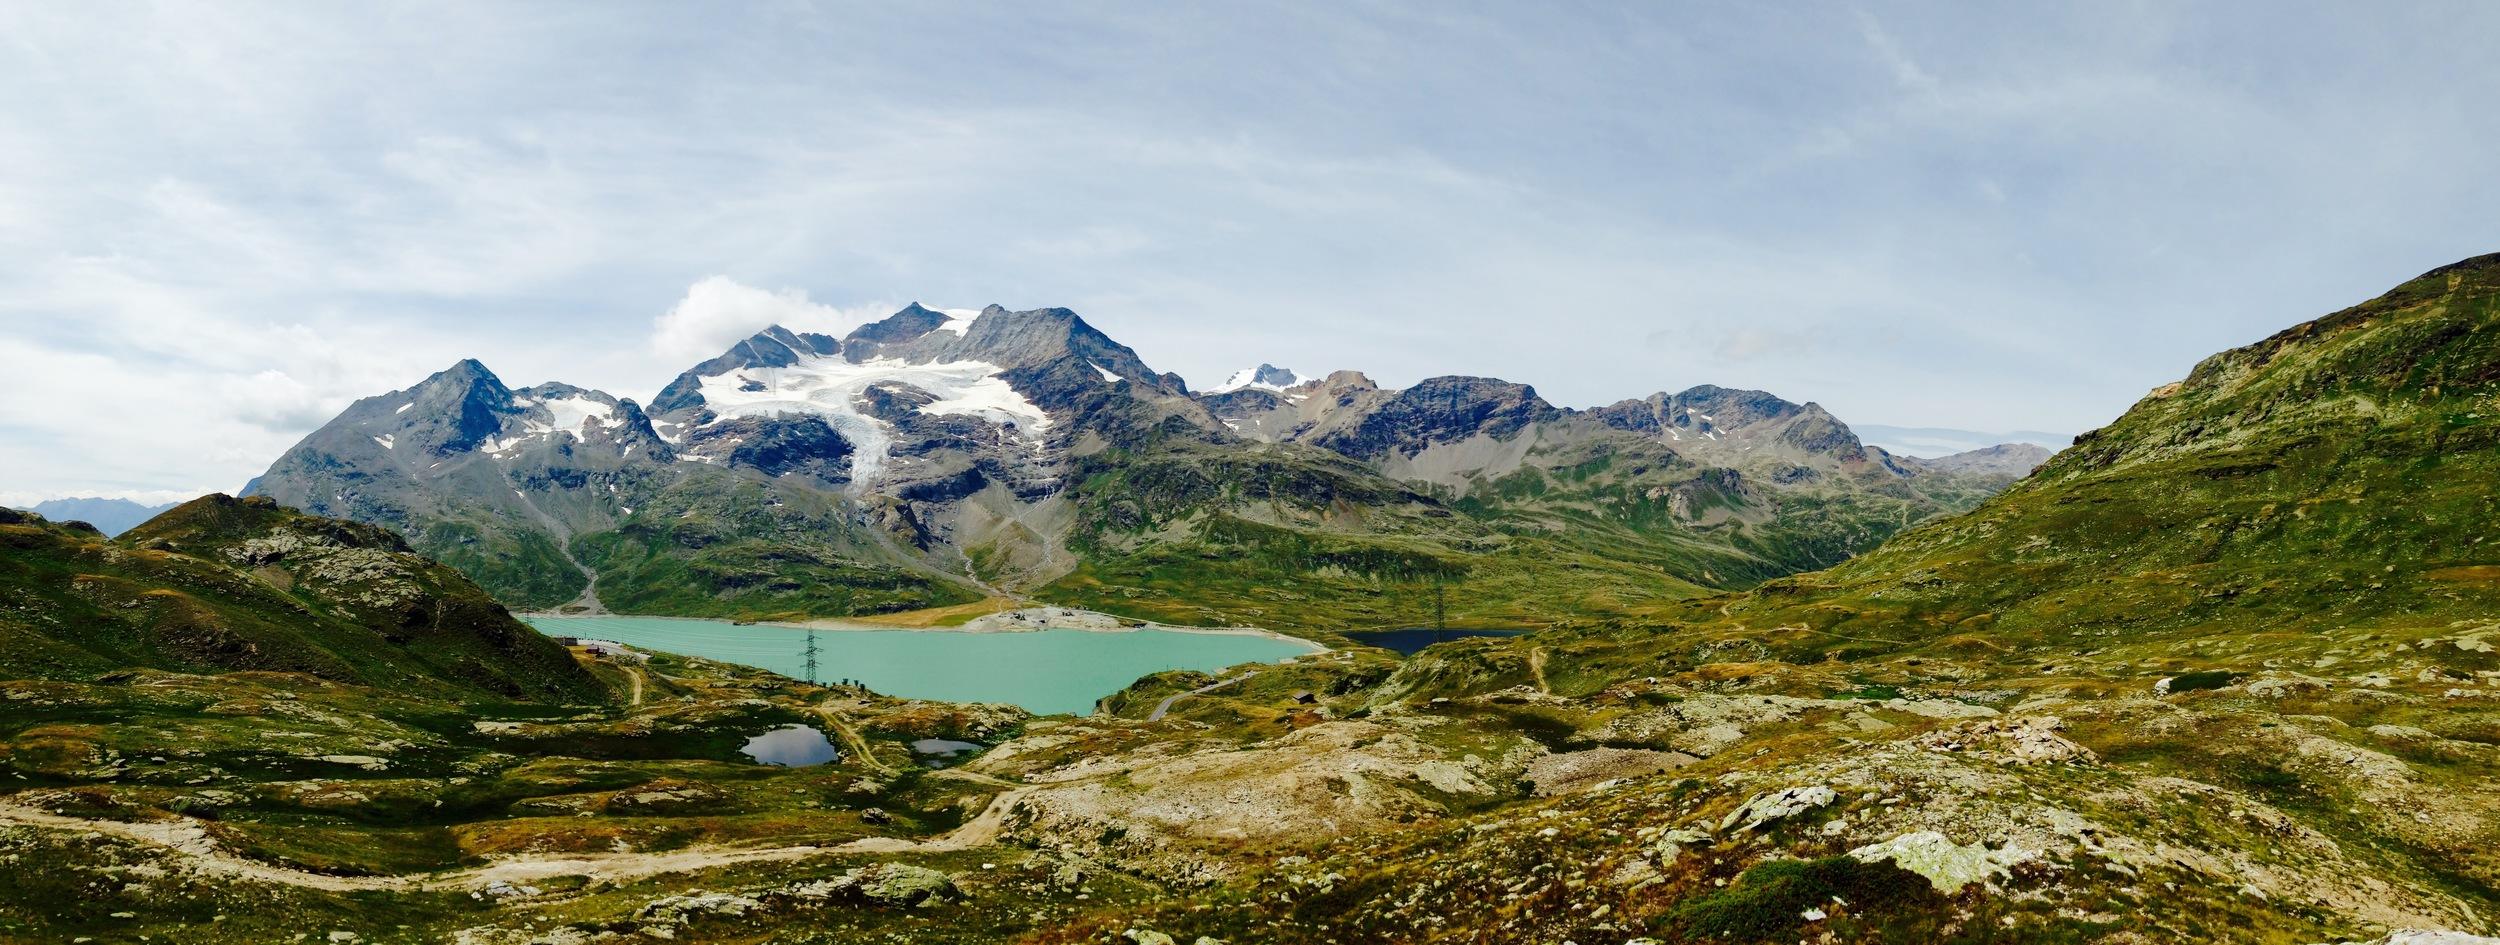 Bernina e Lago Bianco